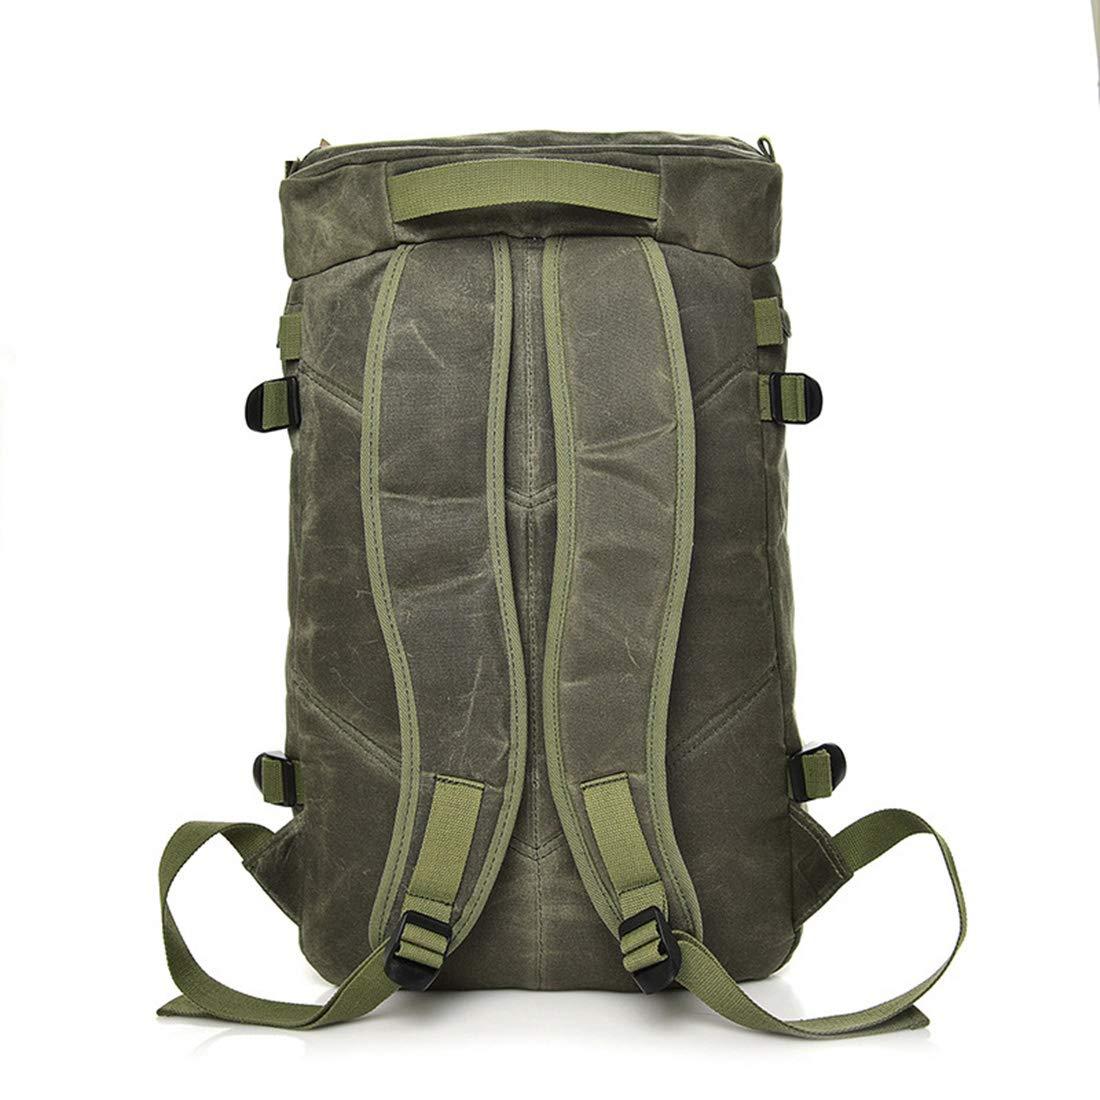 Lokijuge Mens Backpacks Canvas Bag Travel Backpack Outdoor Short Paragraph Waterproof Canvas Bag